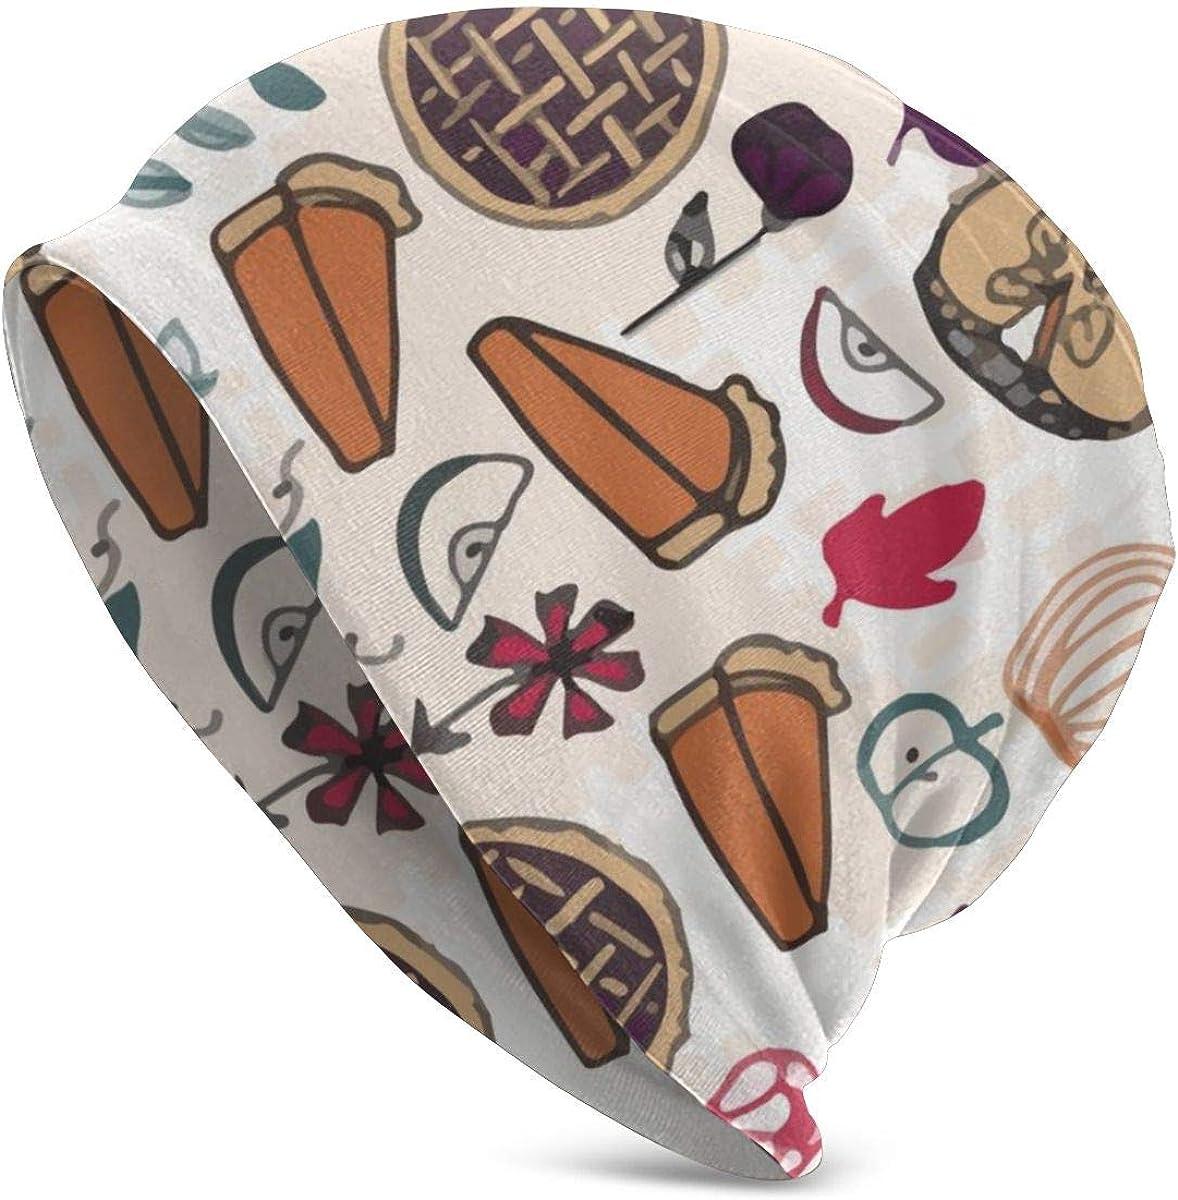 Beanie Men Women Thanksgiving Pumpkin Apple Pie Warm Skull Knit Hat Unisex Slouchy Soft Headwear Cuffed Cap Black